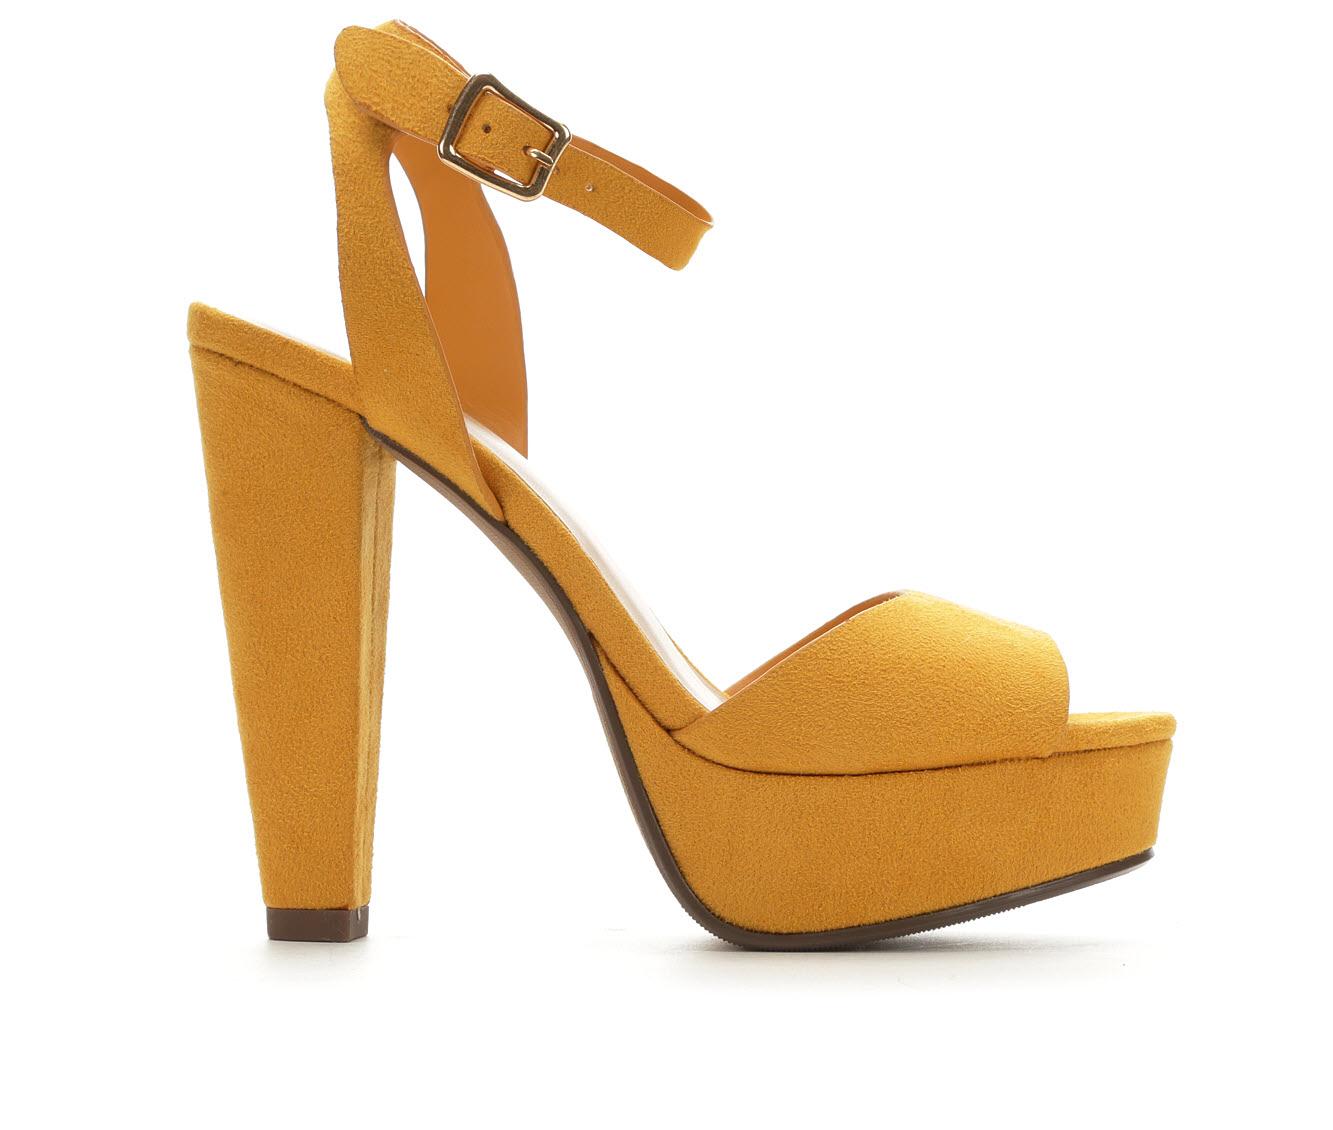 Delicious Purify Women's Dress Shoe (Yellow Canvas)